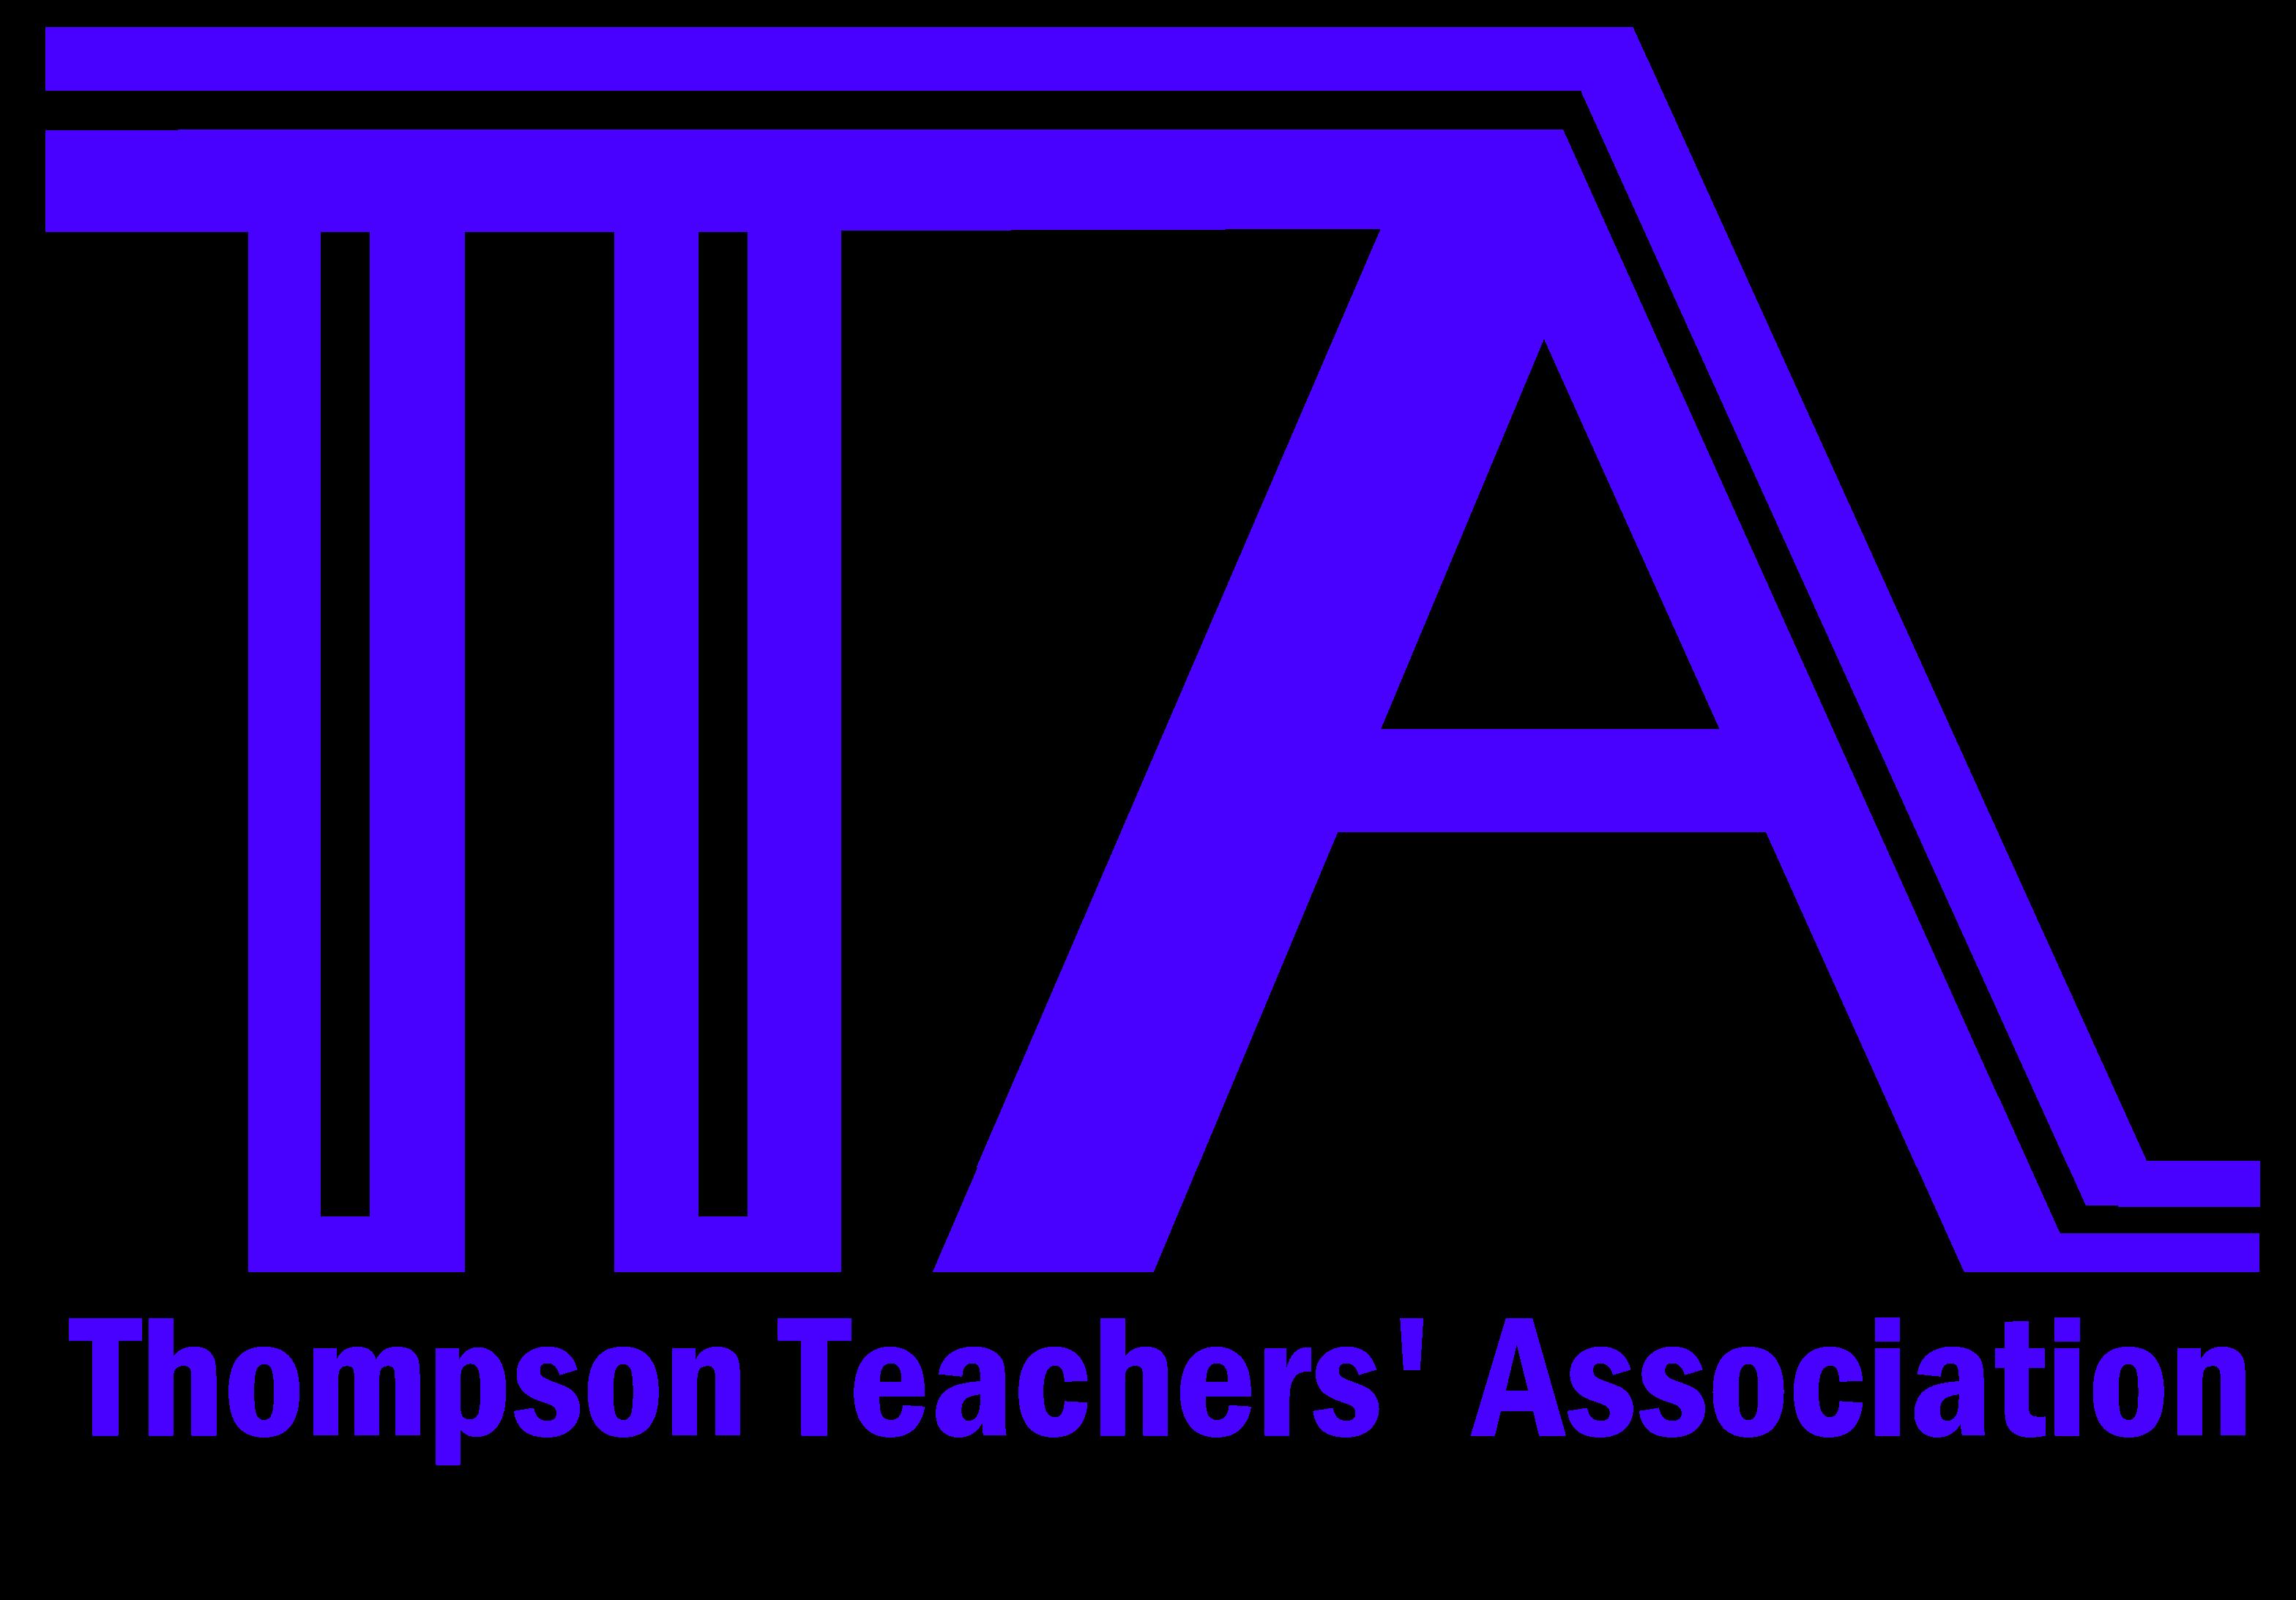 Thompson Teachers' Association